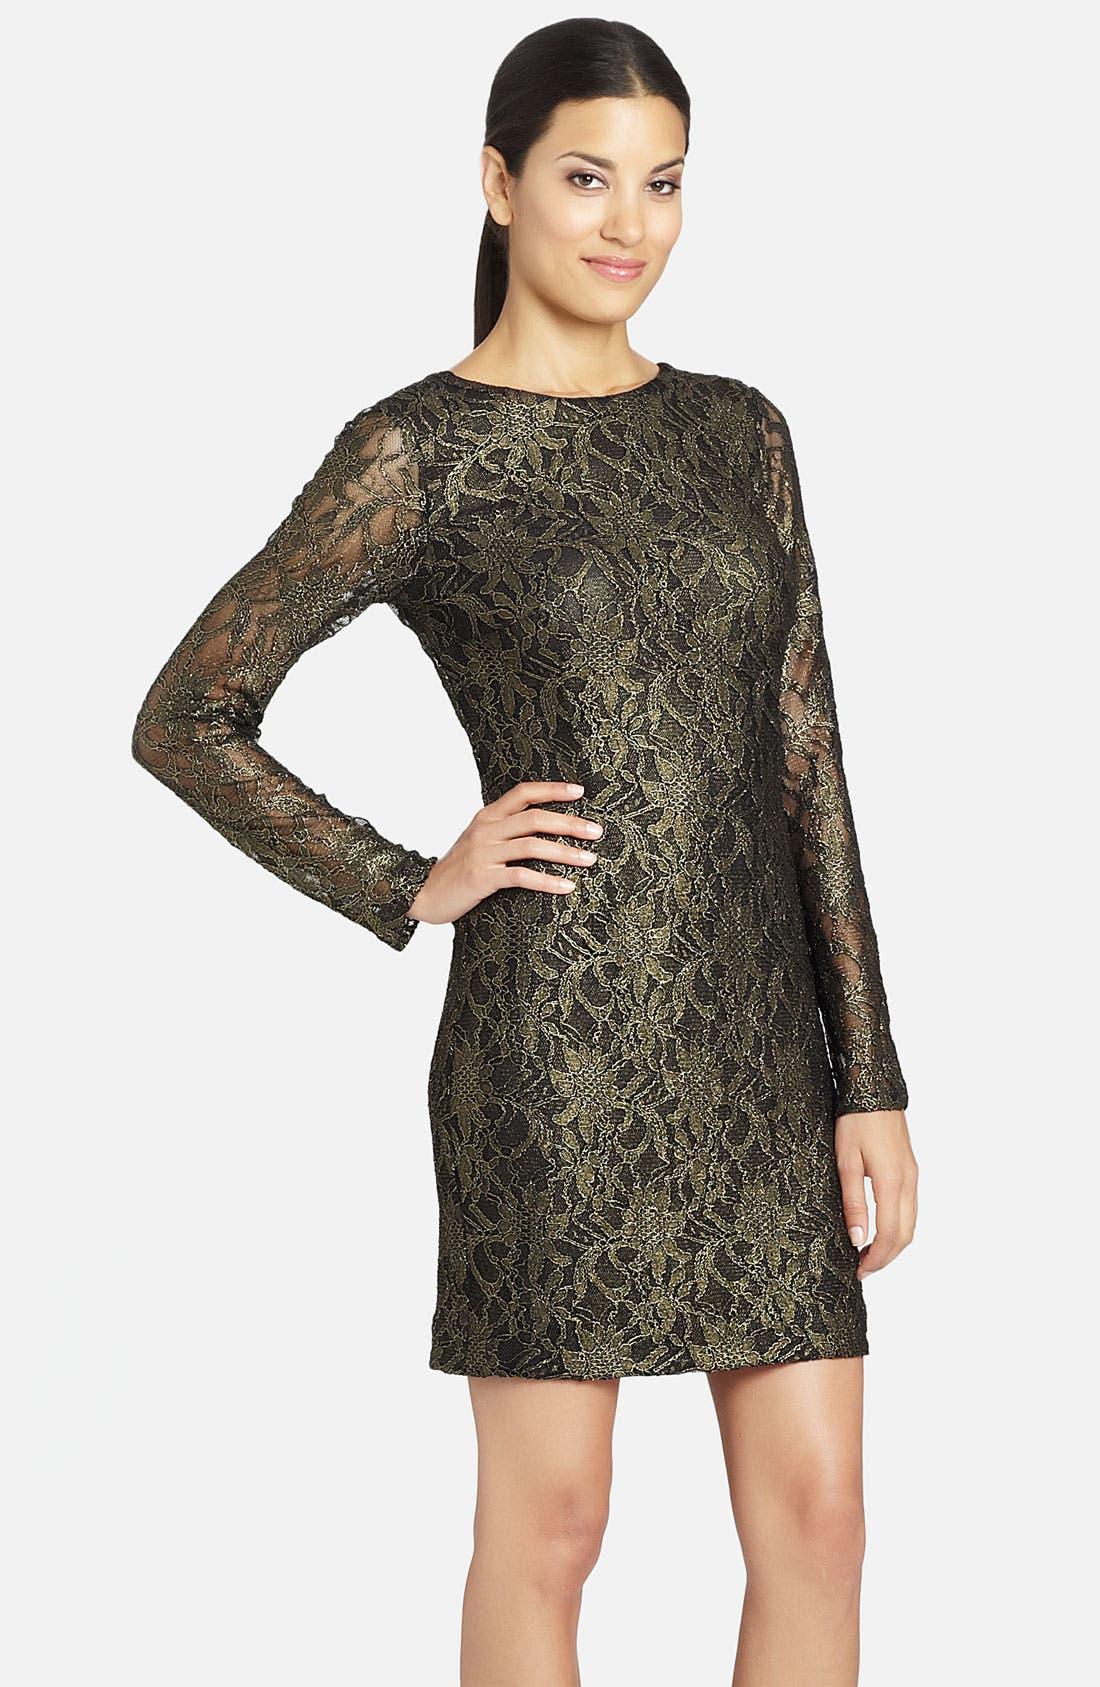 Alternate Image 1 Selected - Cynthia Steffe 'Lydia' Metallic Illusion Sleeve Lace Dress